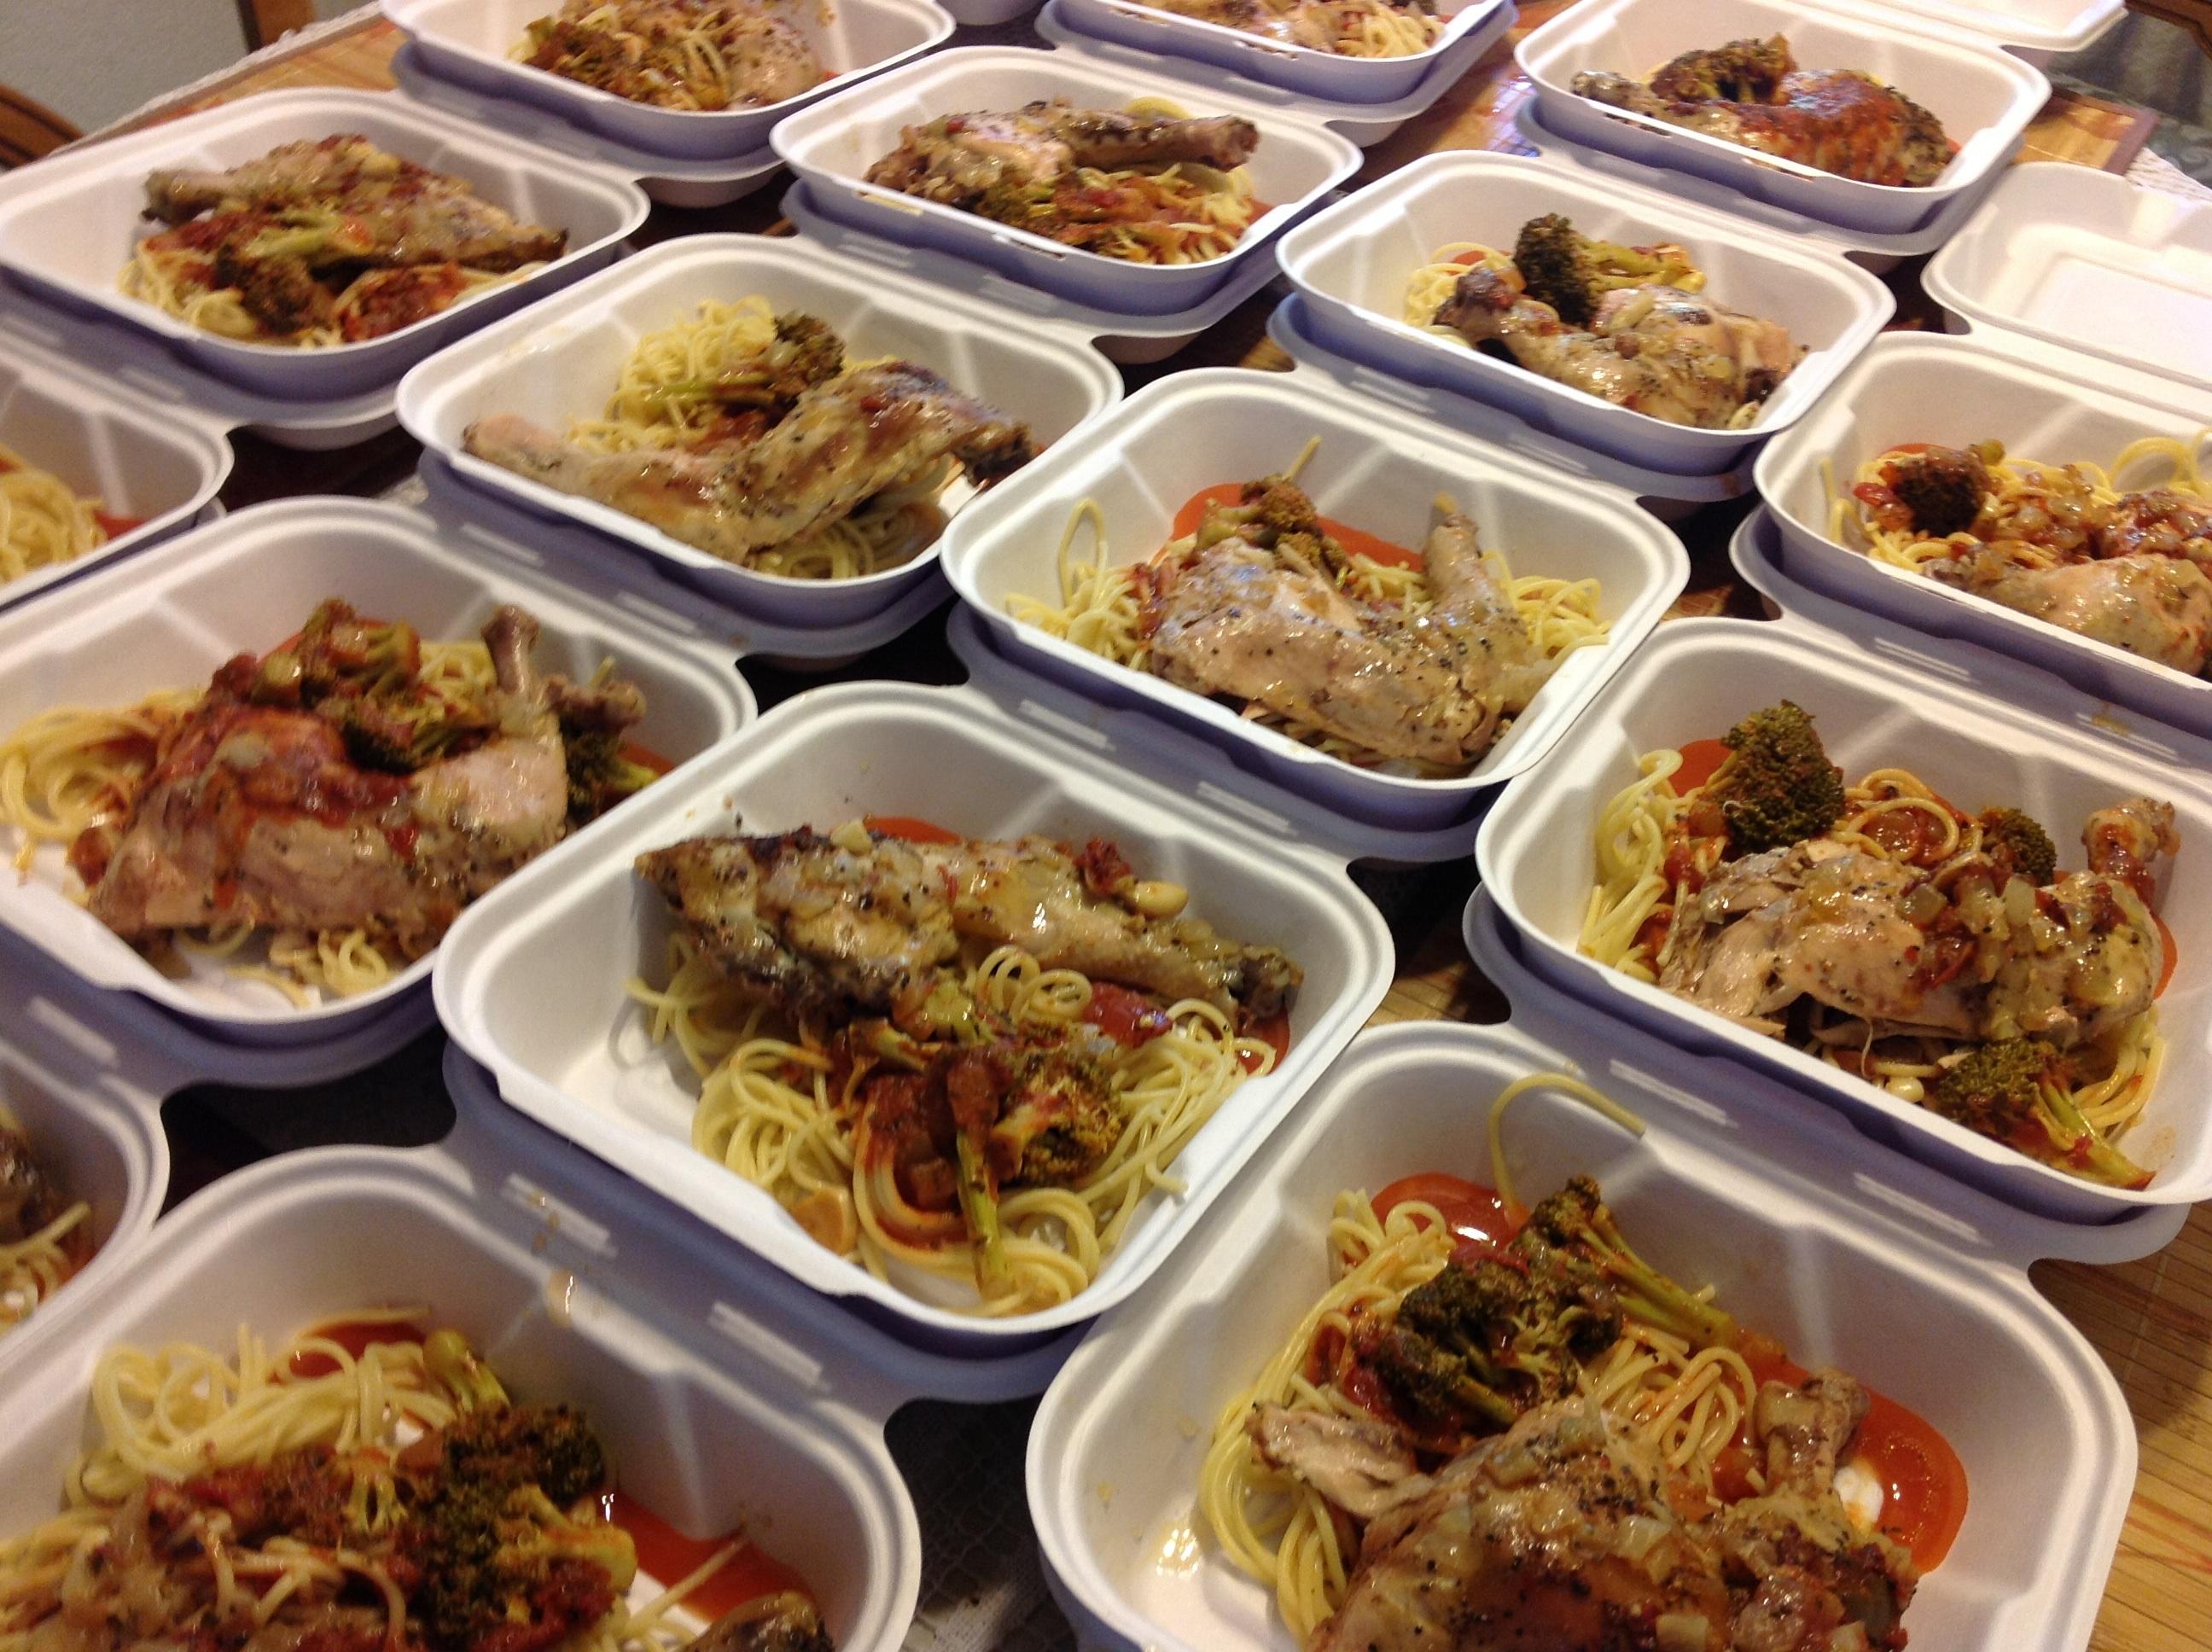 Image ar razzaq food bankar razzaq food bank for Arkansas cuisine